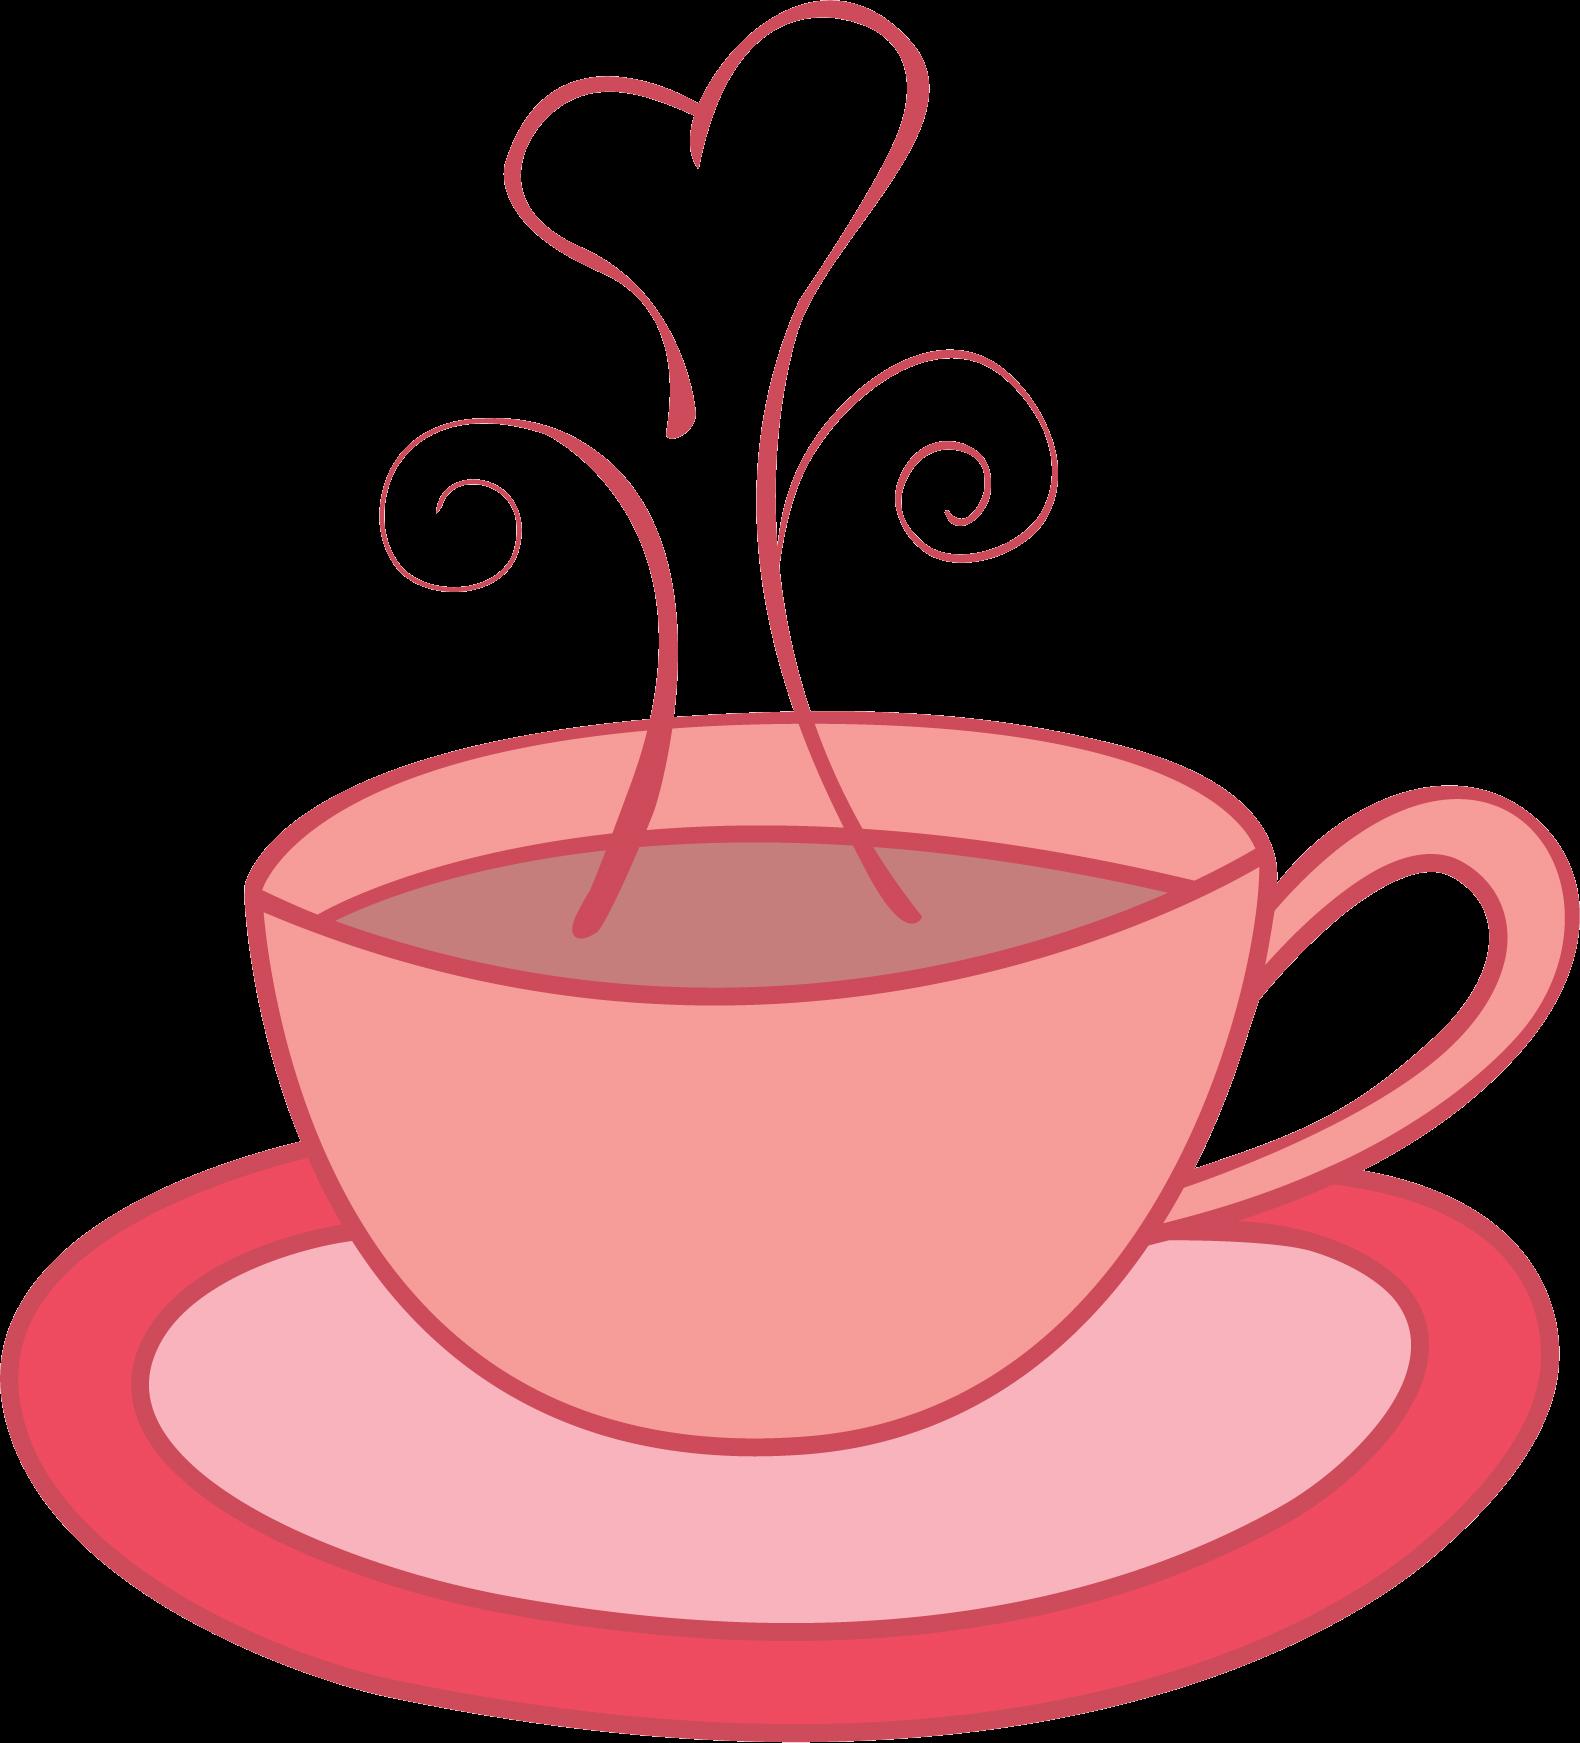 teacup clipart clipground